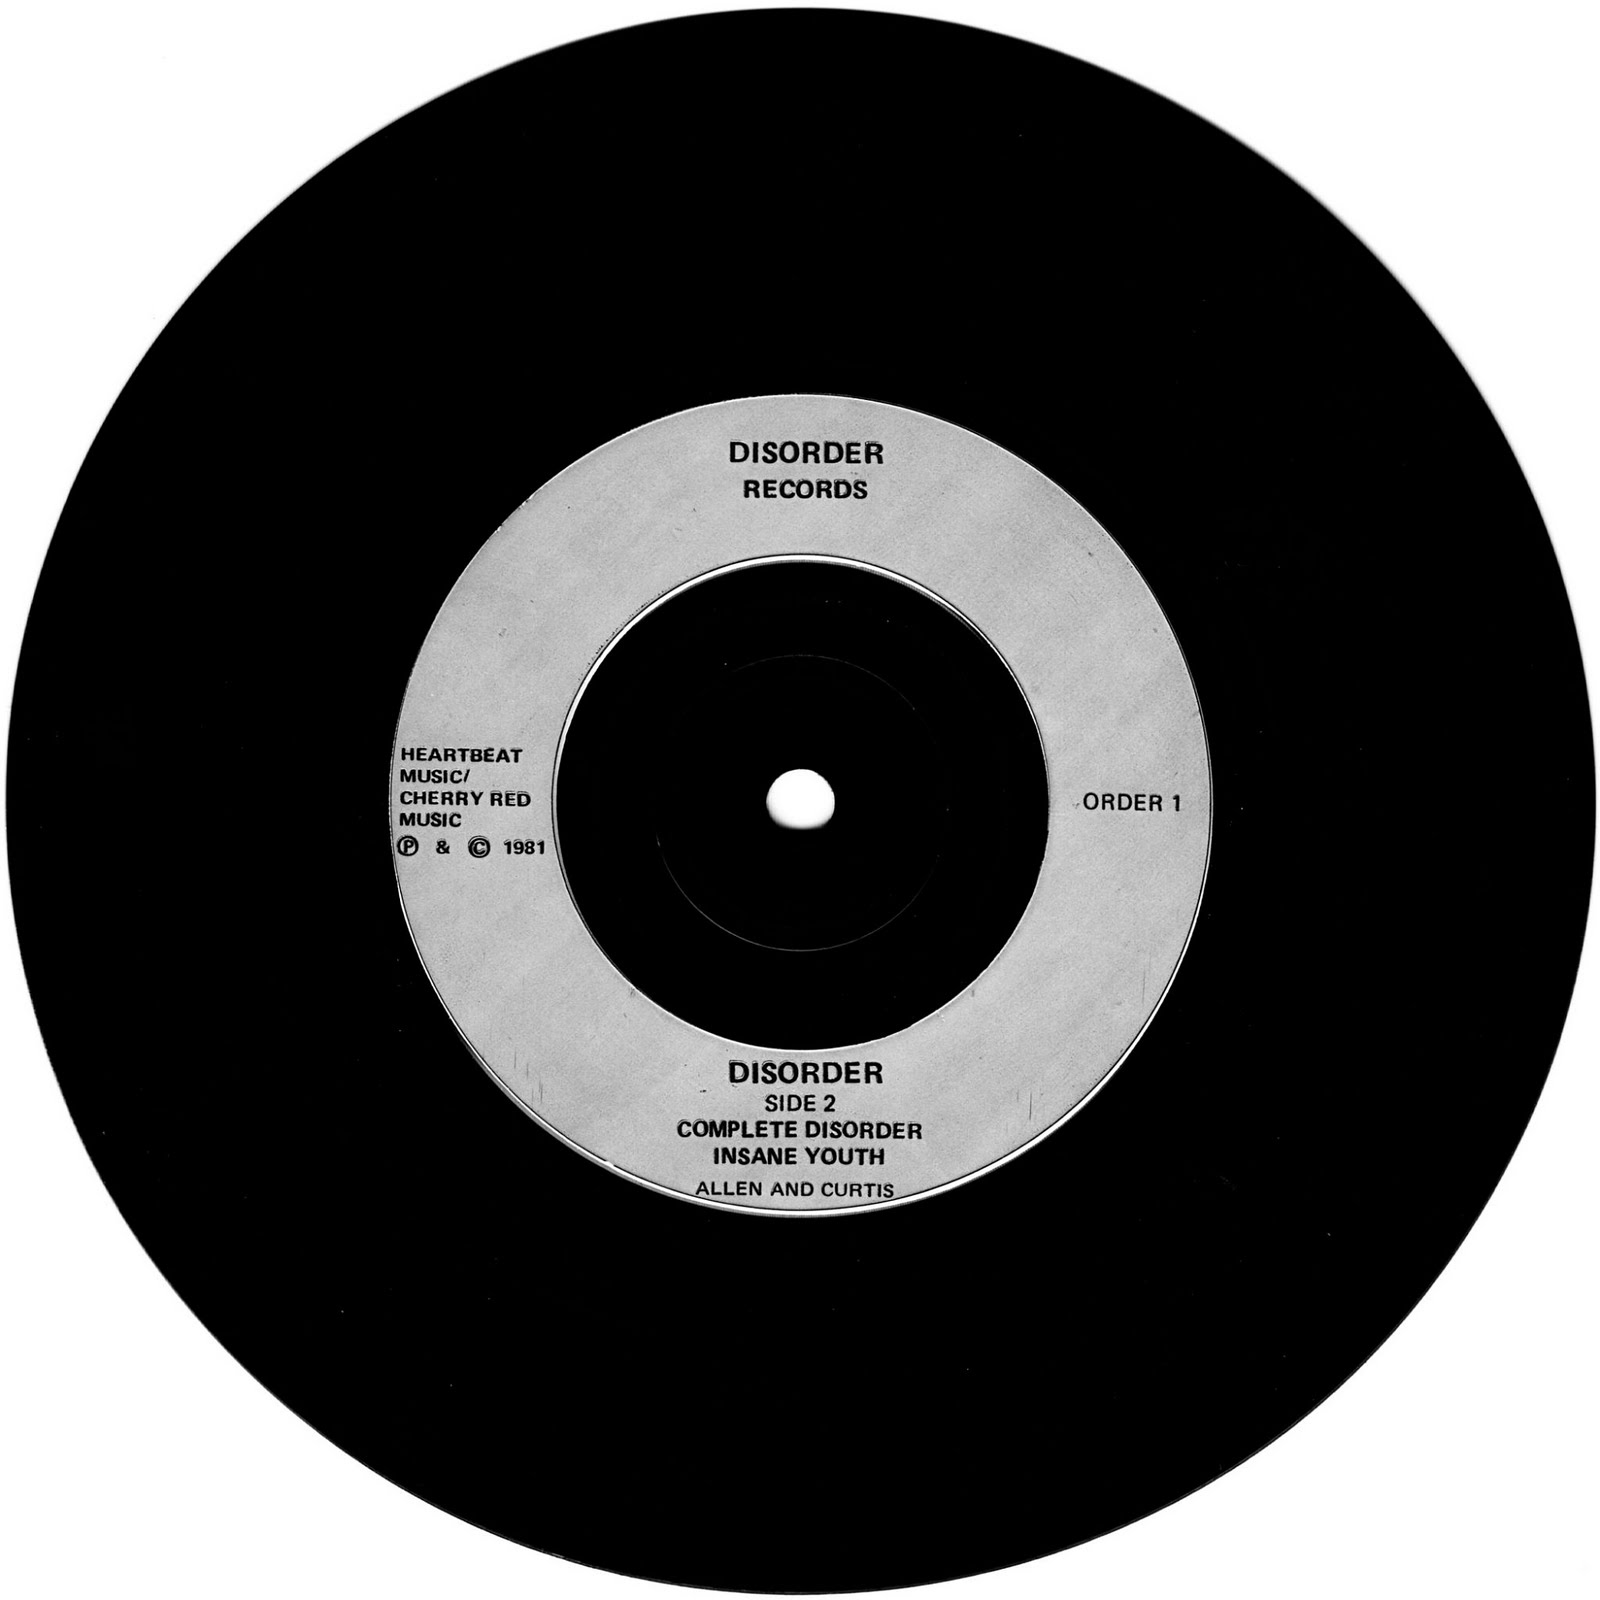 Disorder Perdition EP